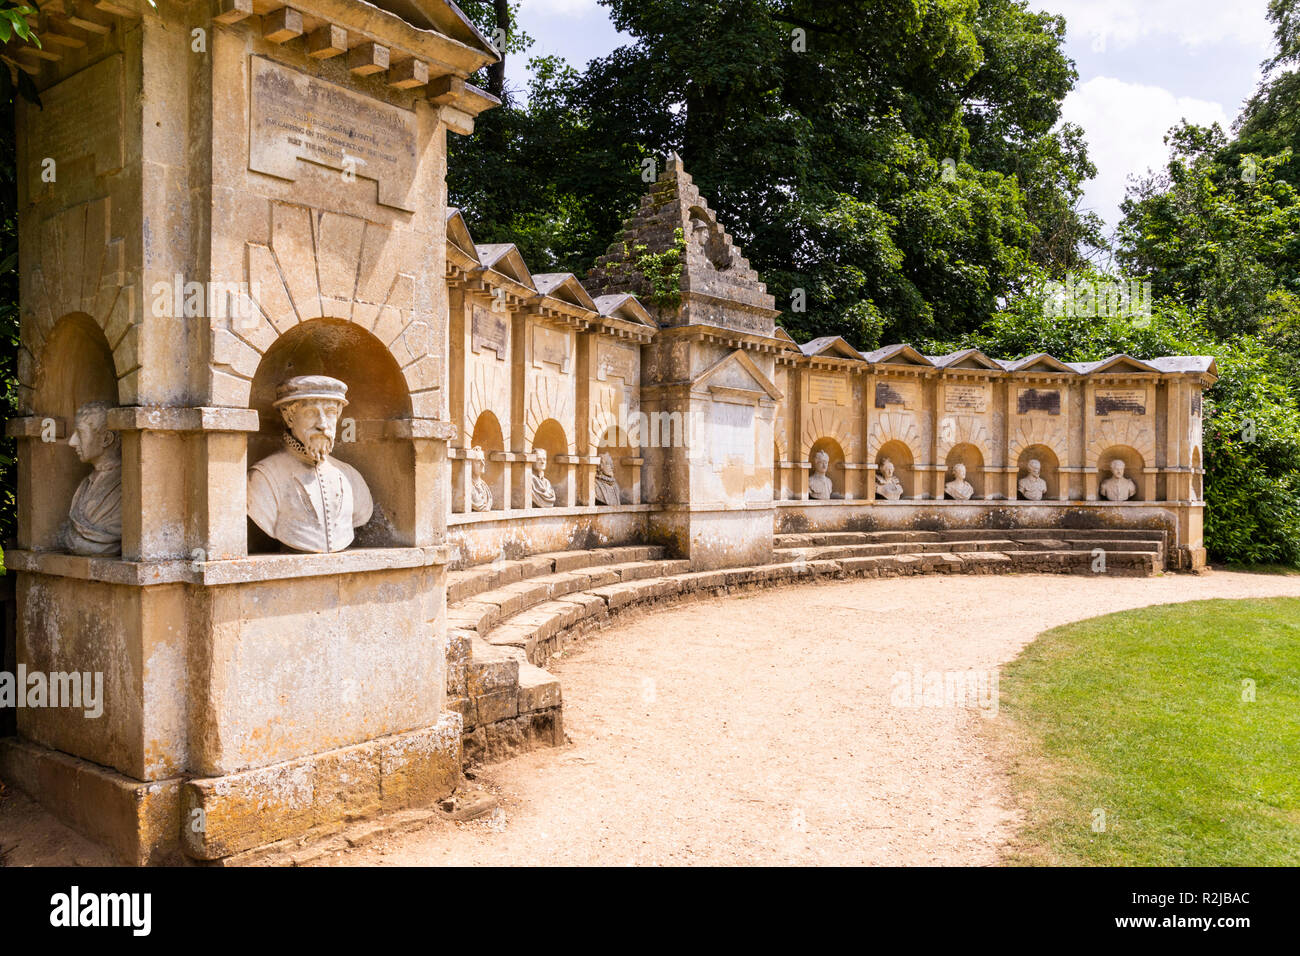 The Temple of British Worthies in Stowe House Gardens, Buckinghamshire UK - Stock Image